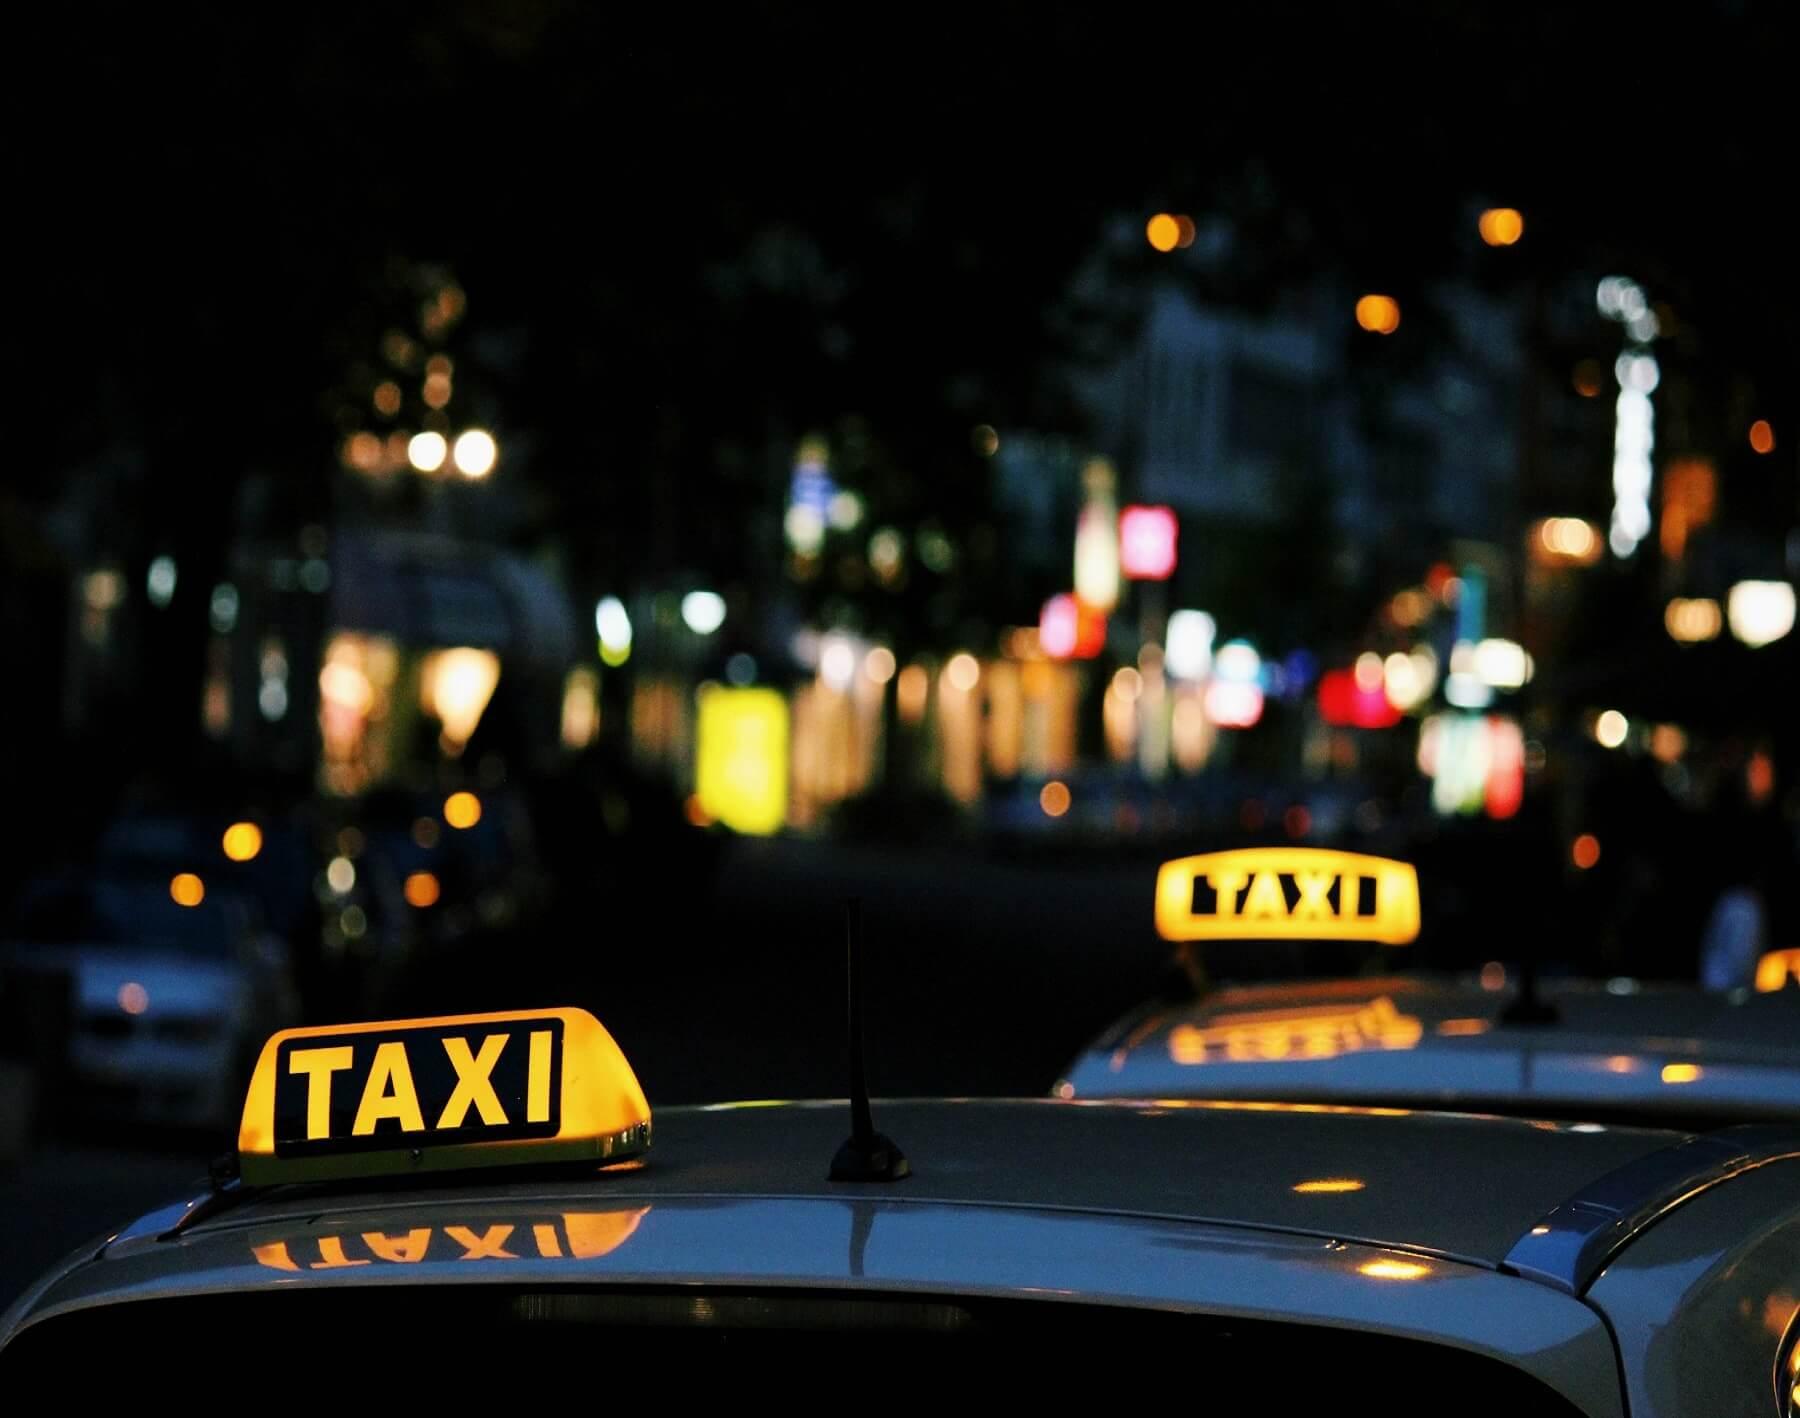 Taxis Blackfen, Sherbets Mini Cabs